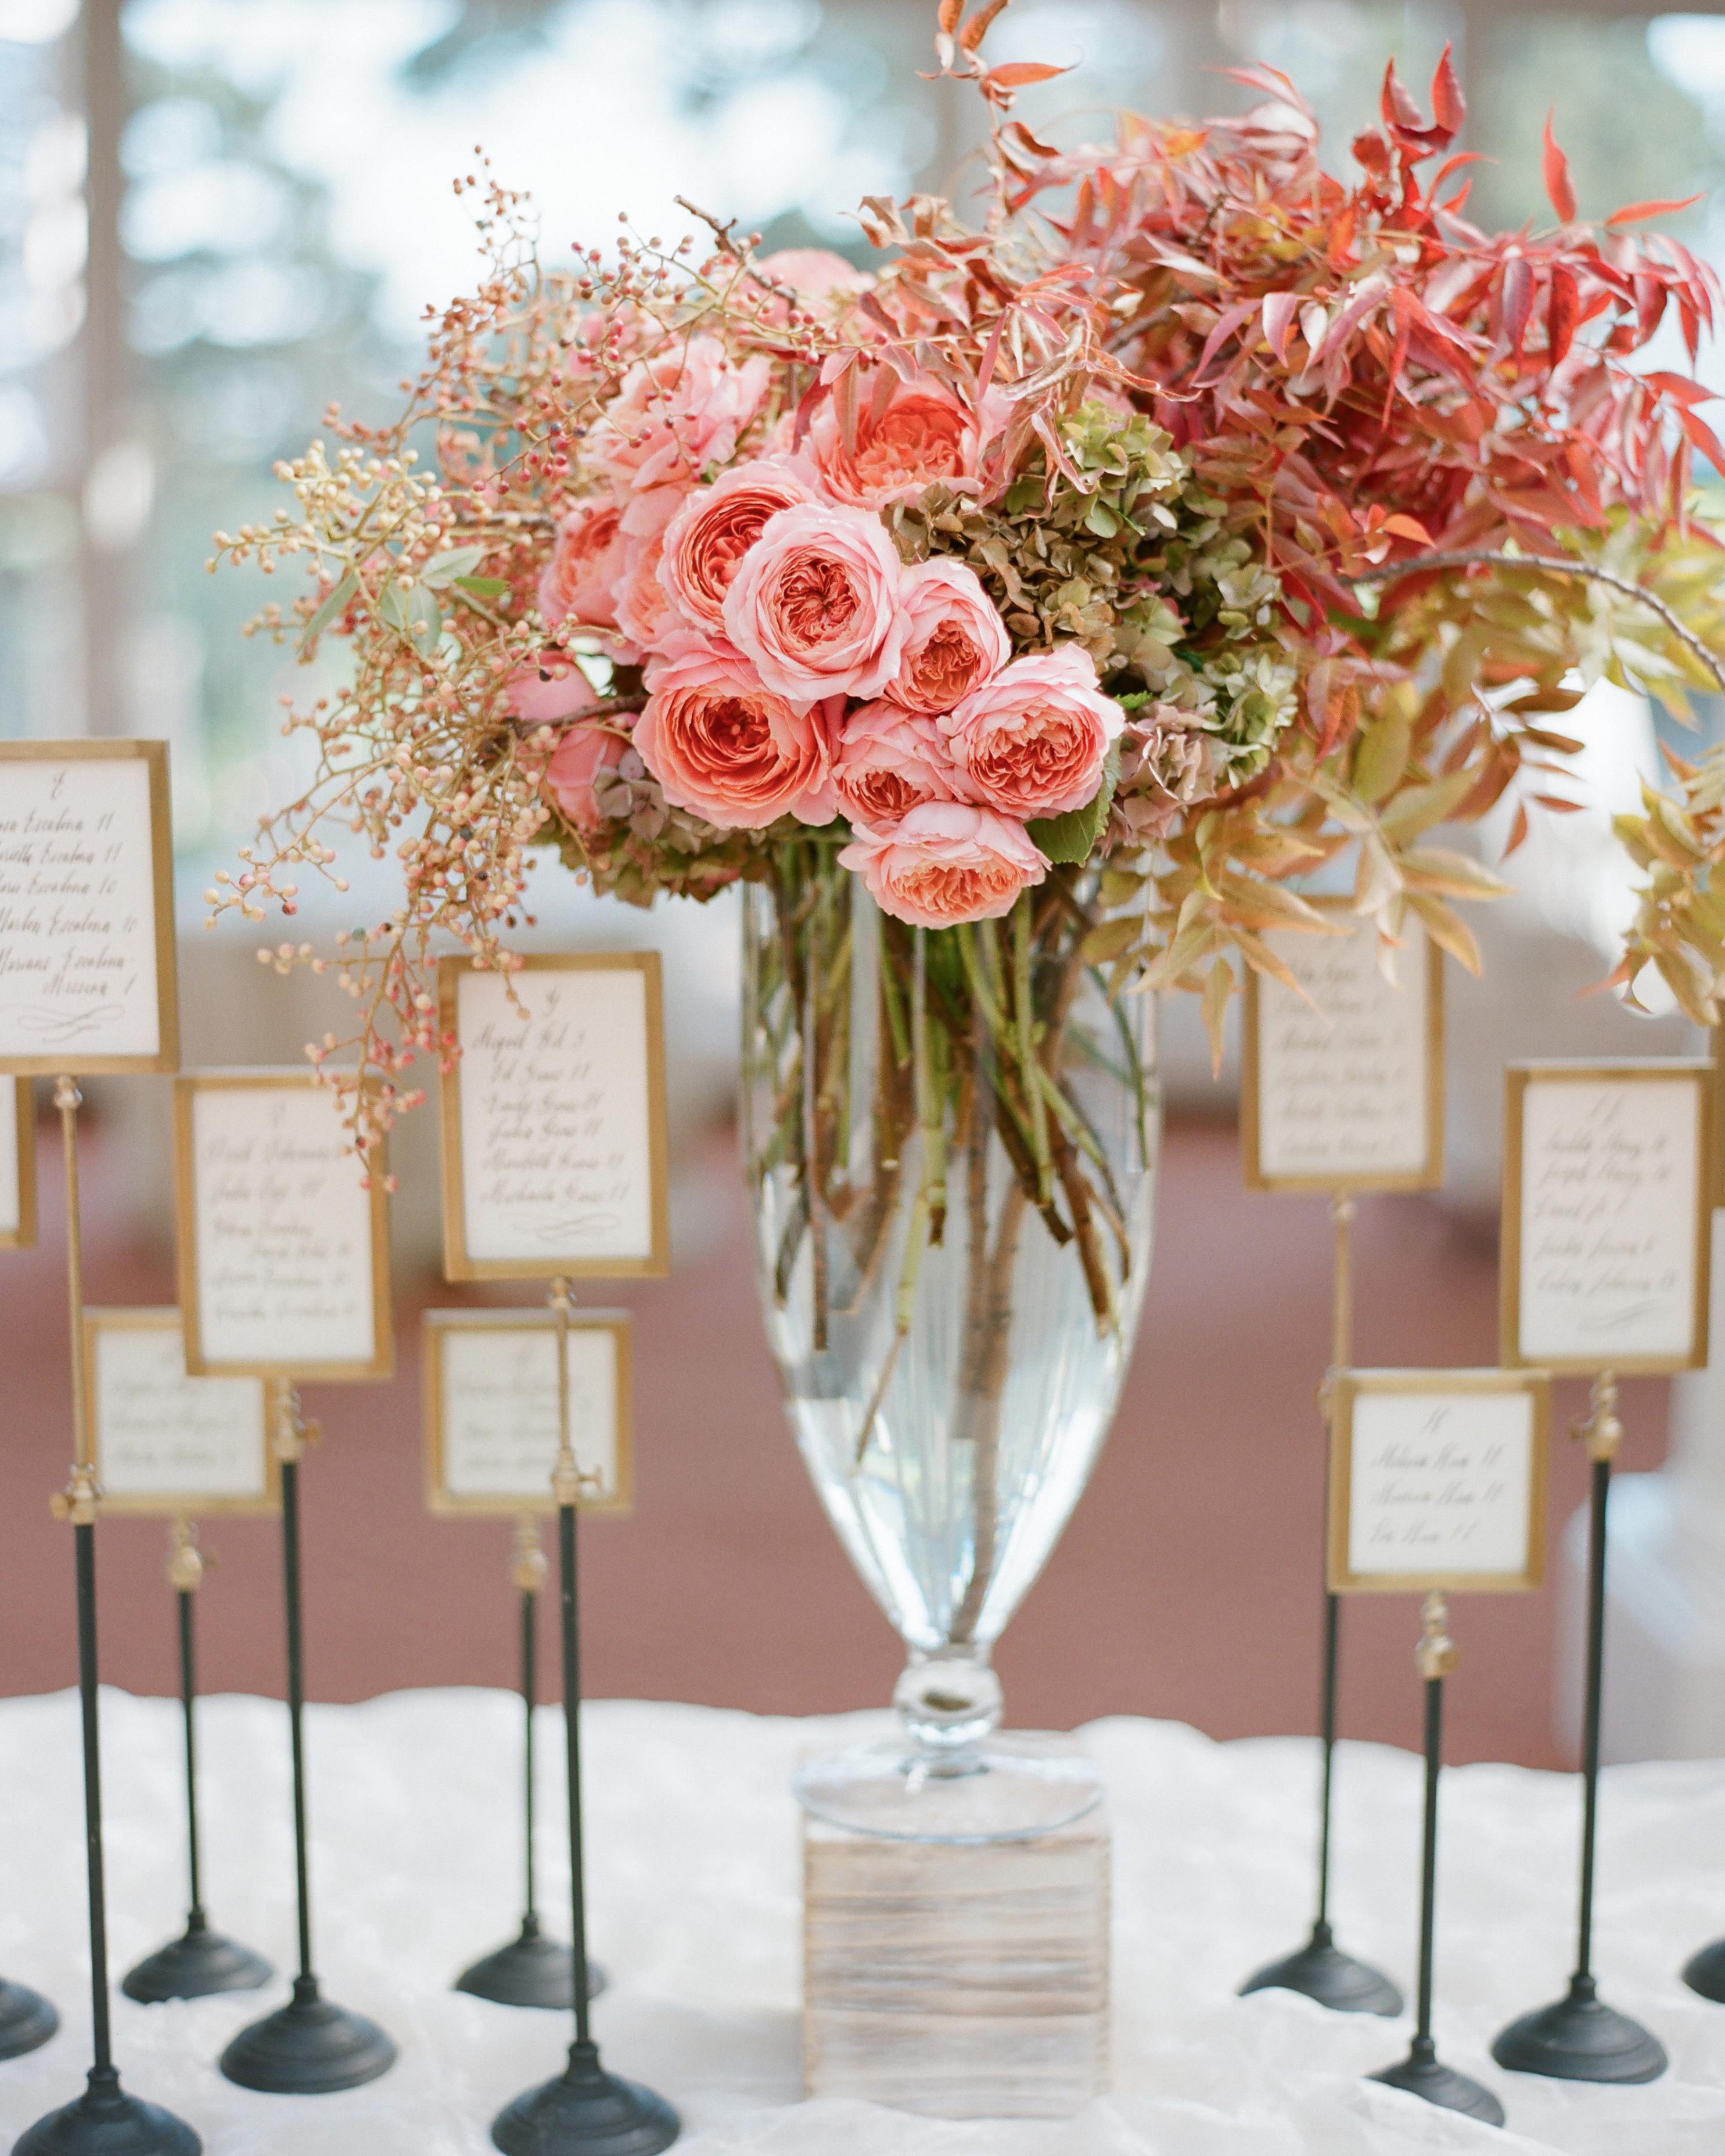 marianne-ian-wedding-flowers-0414.jpg